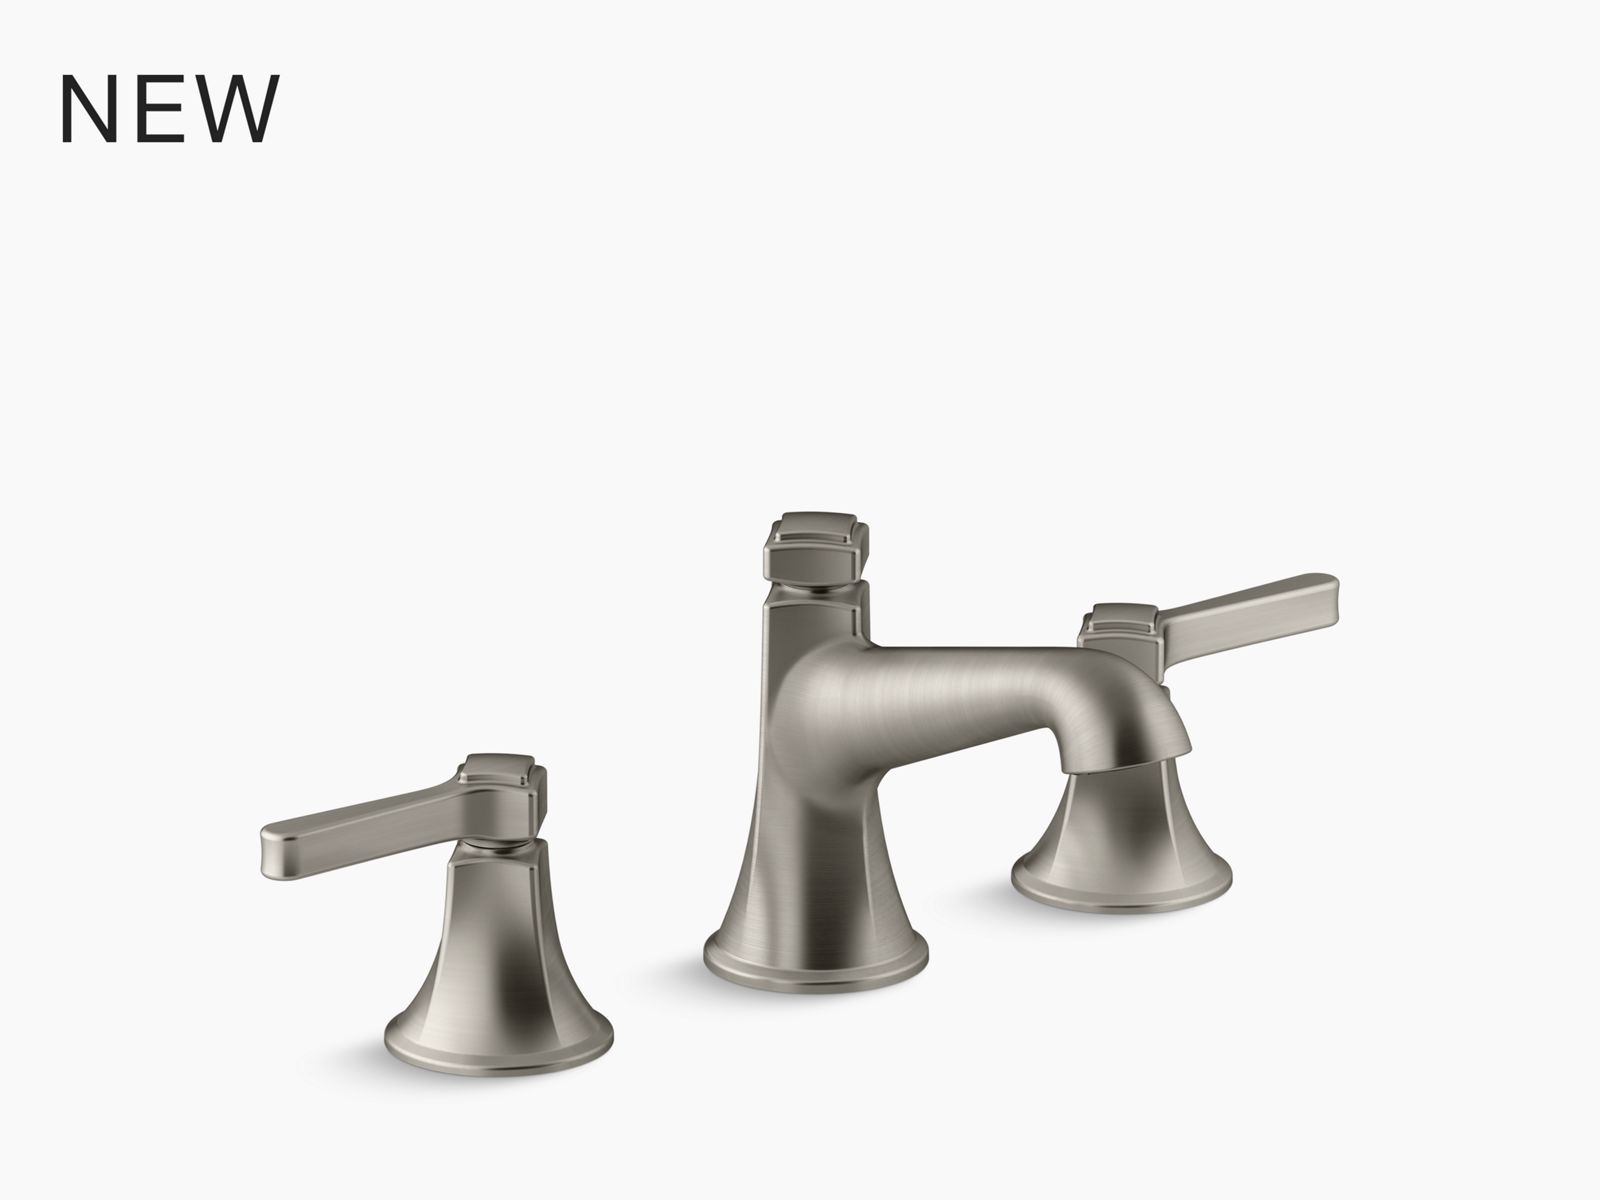 elliston pedestal bathroom sink with 4 centerset faucet holes